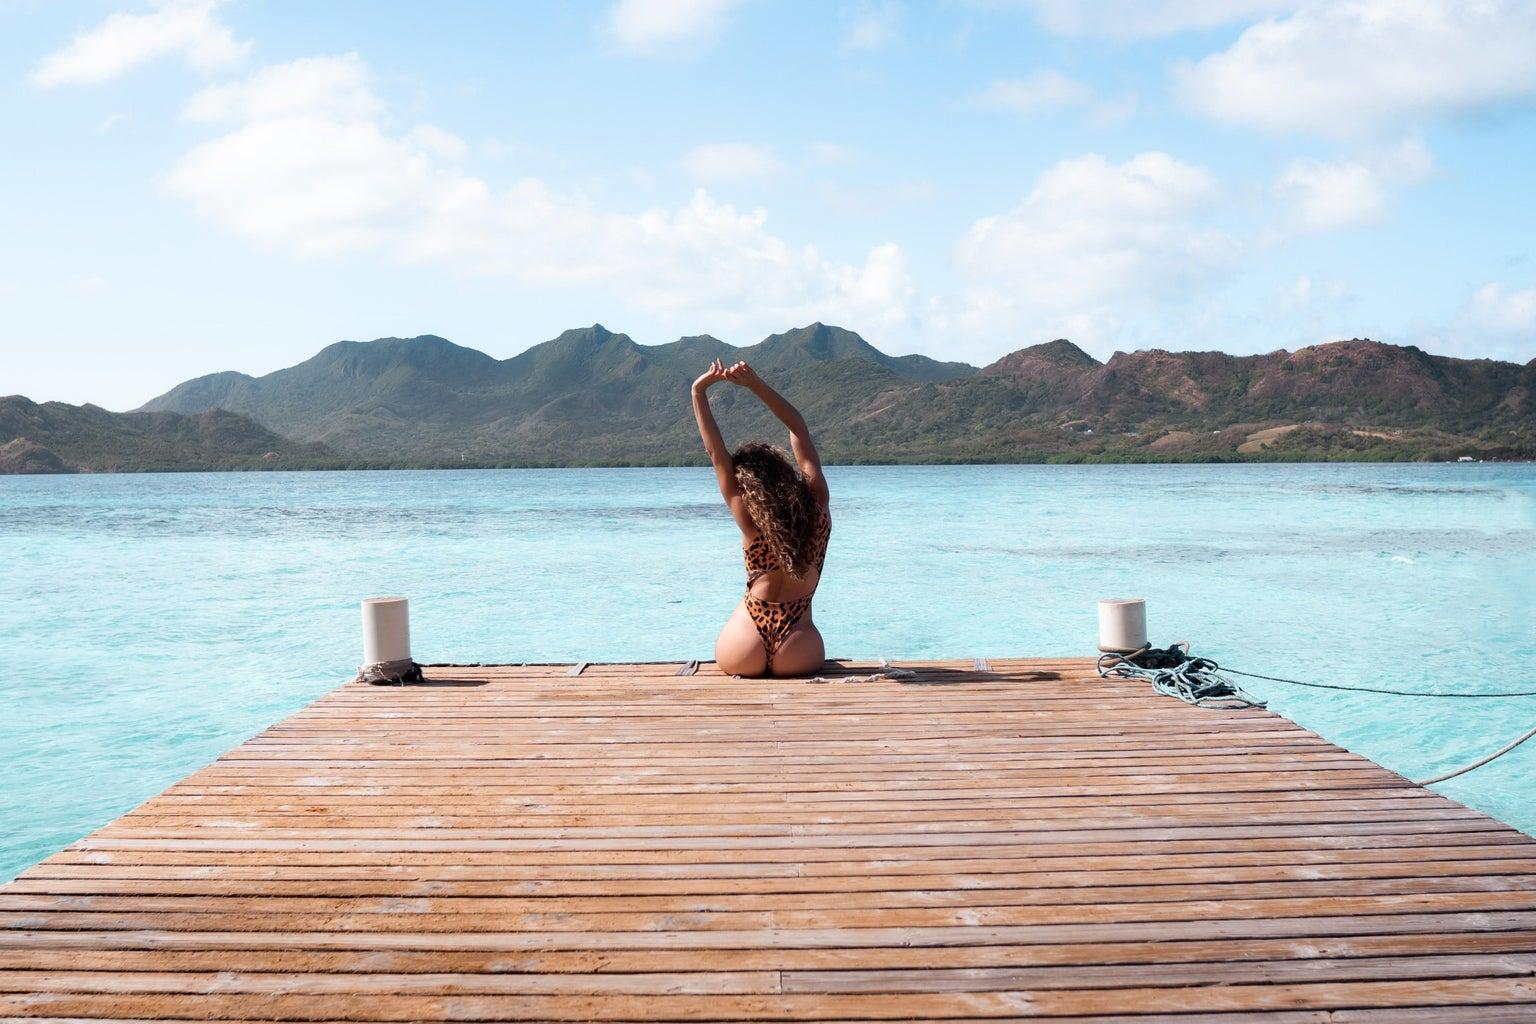 woman sitting on wooden dock